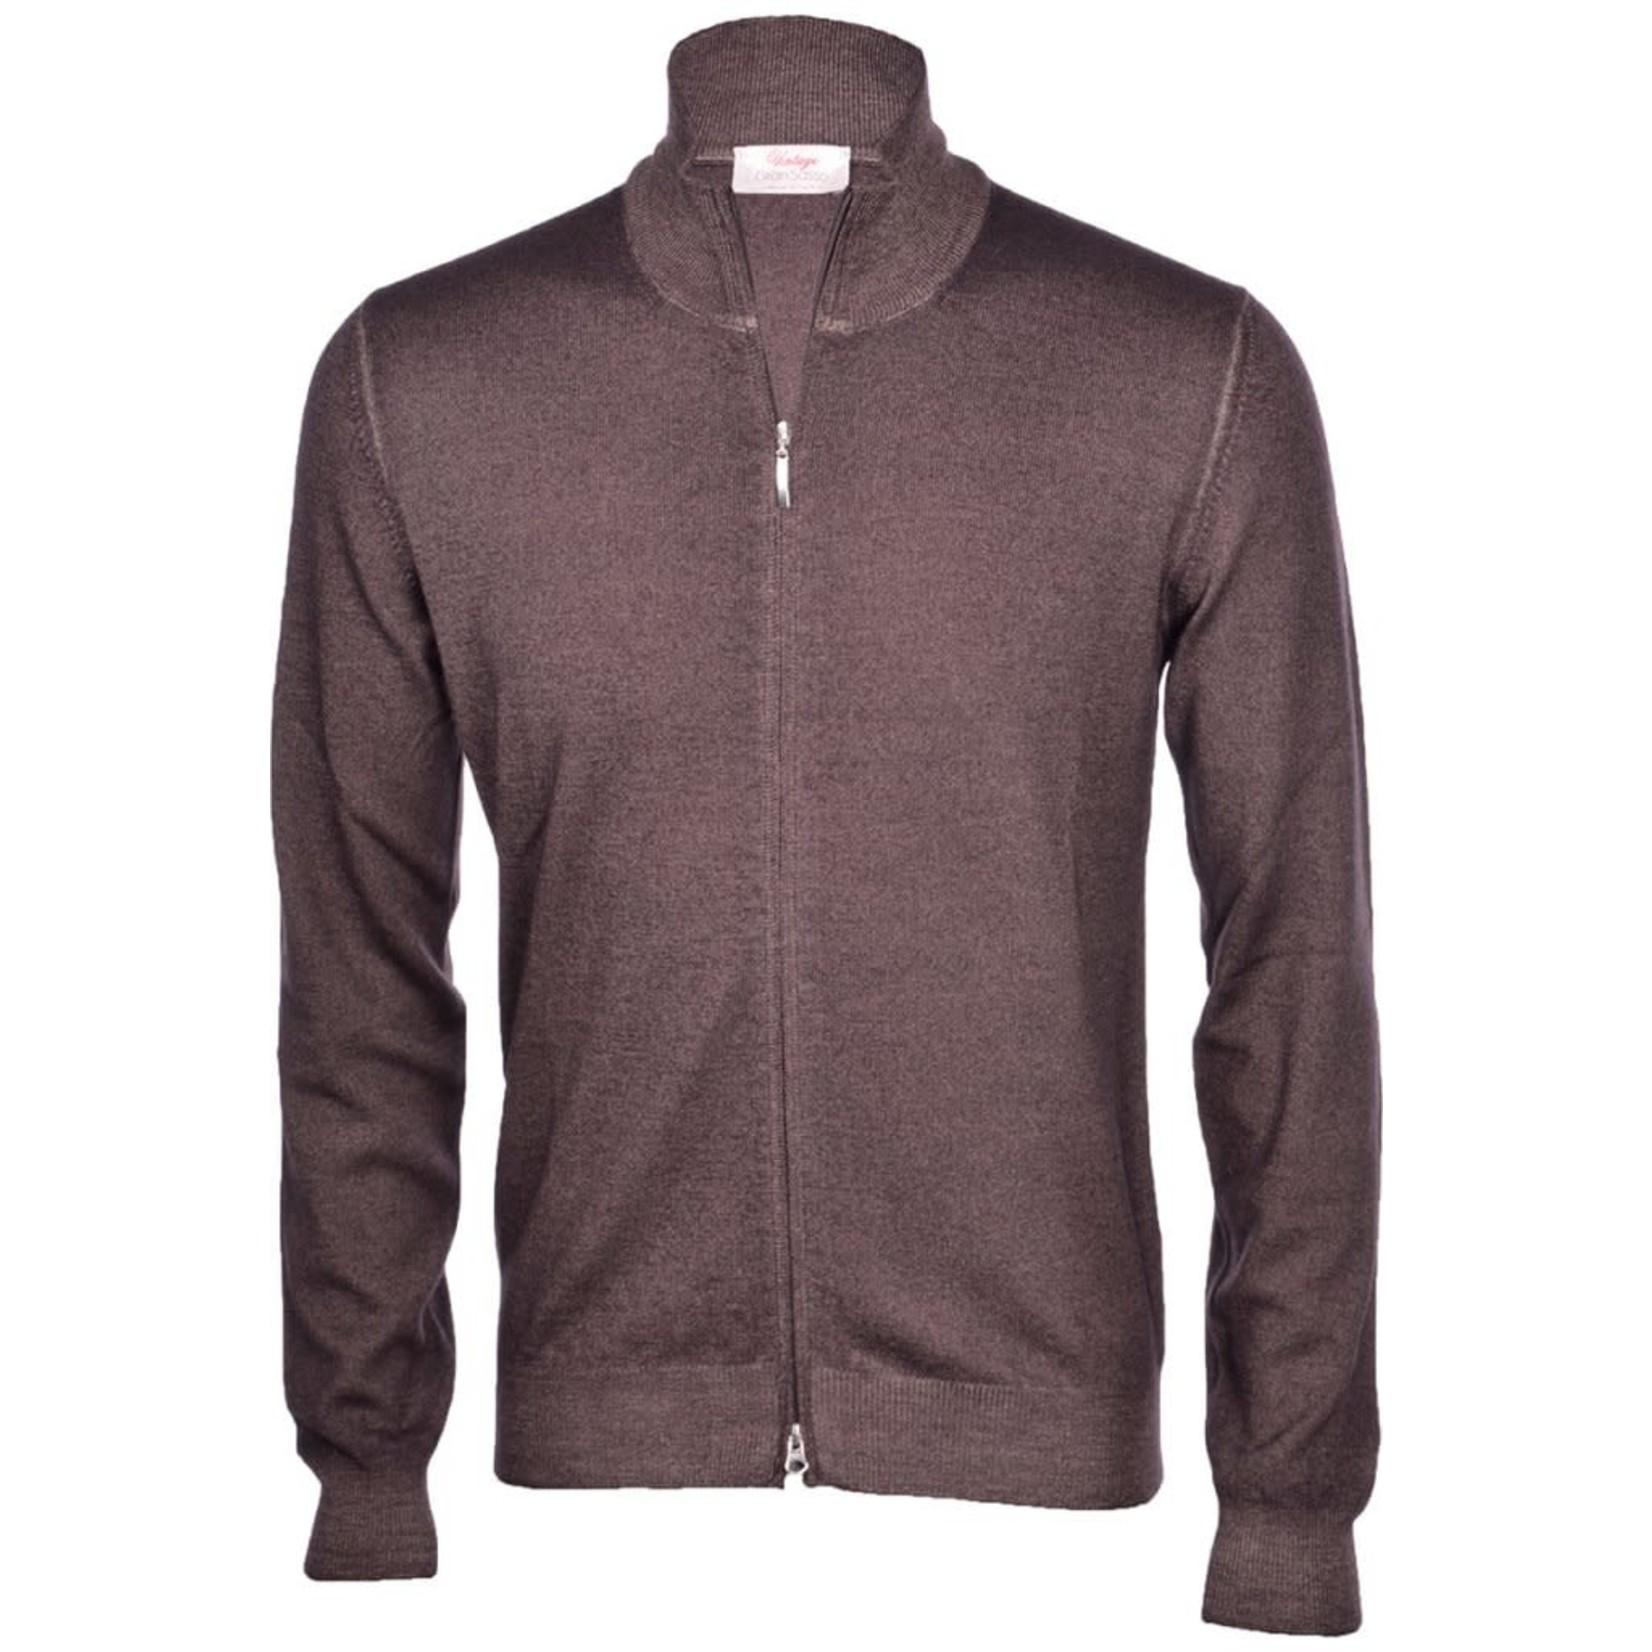 Cellini vest taupe